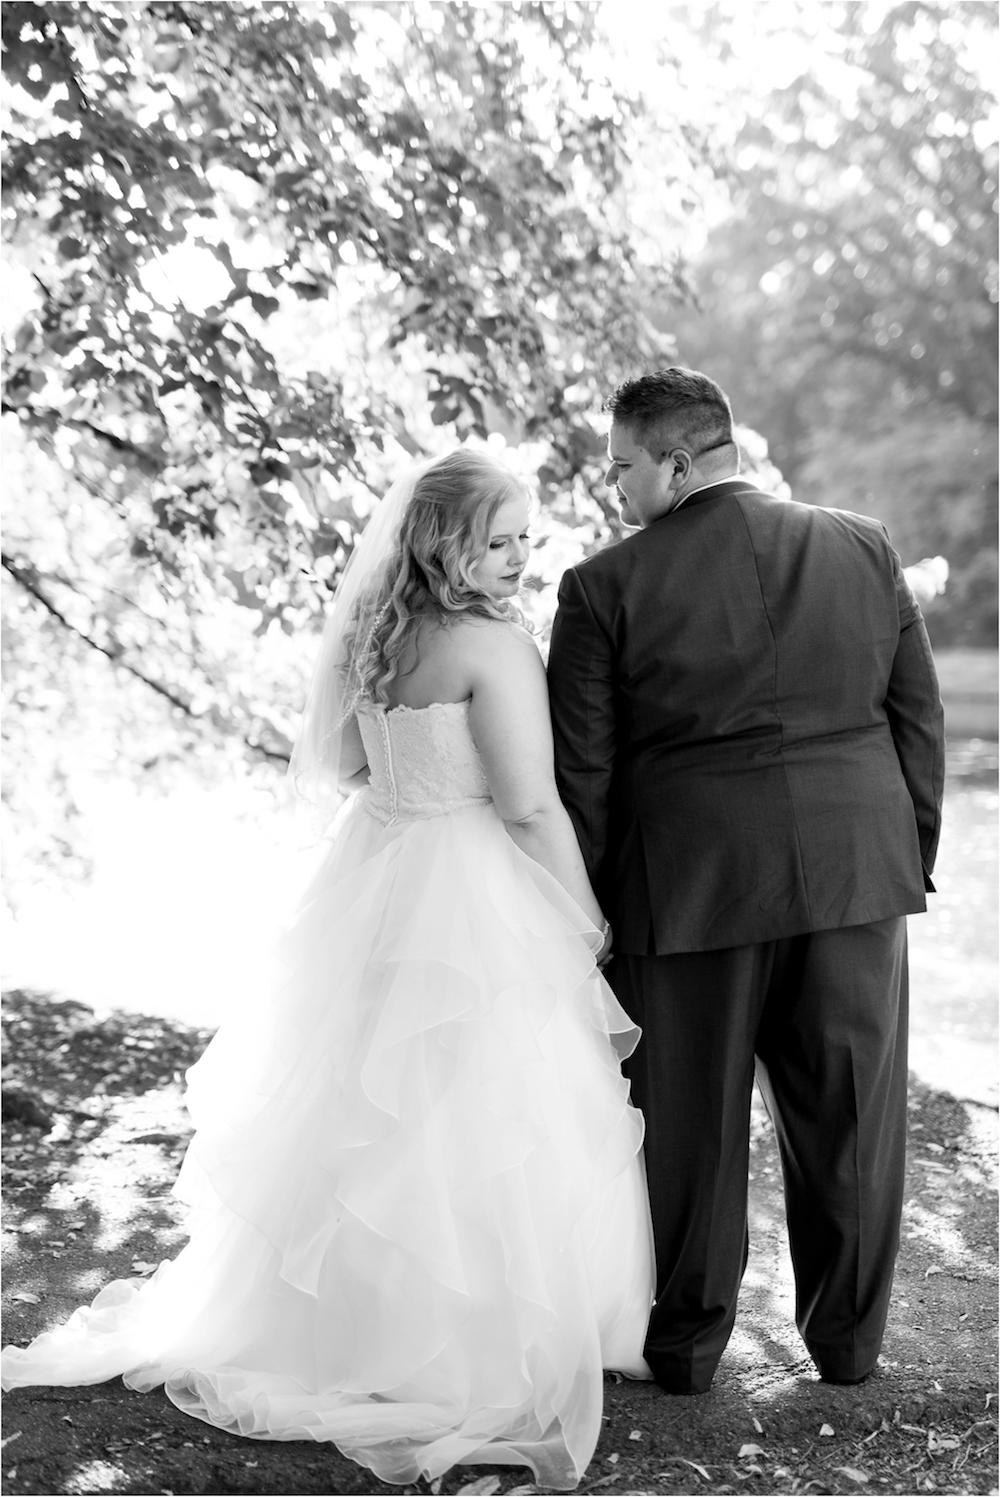 dearborn-michigan-wedding-photo-156.jpg